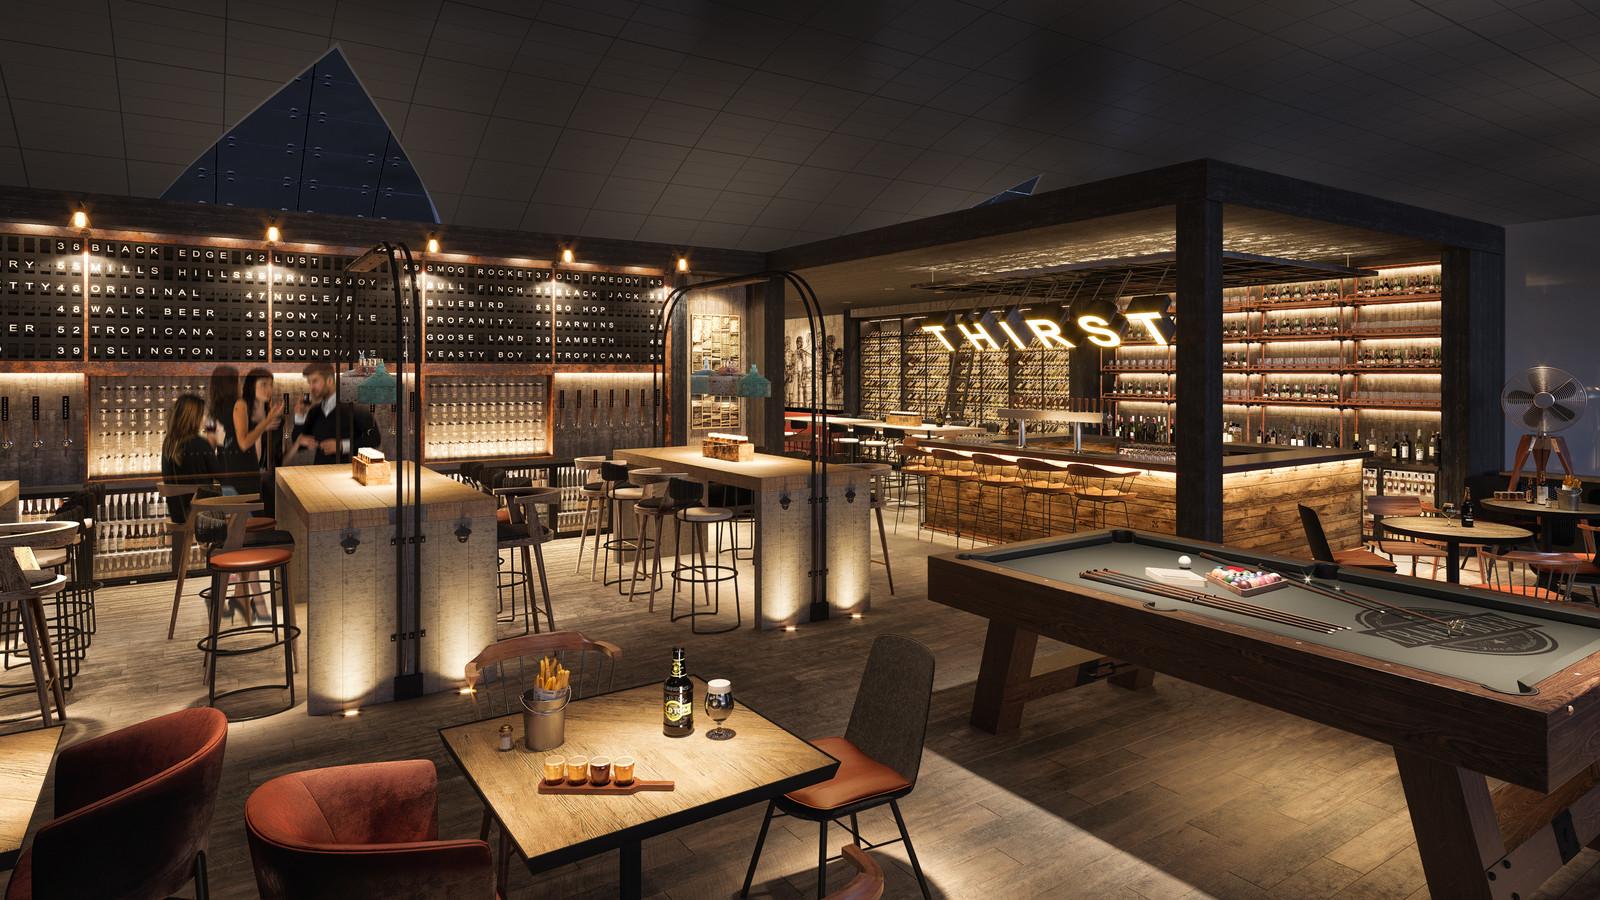 Airport craft beer bar   Architectural and Interior Design CGIs   UK ...